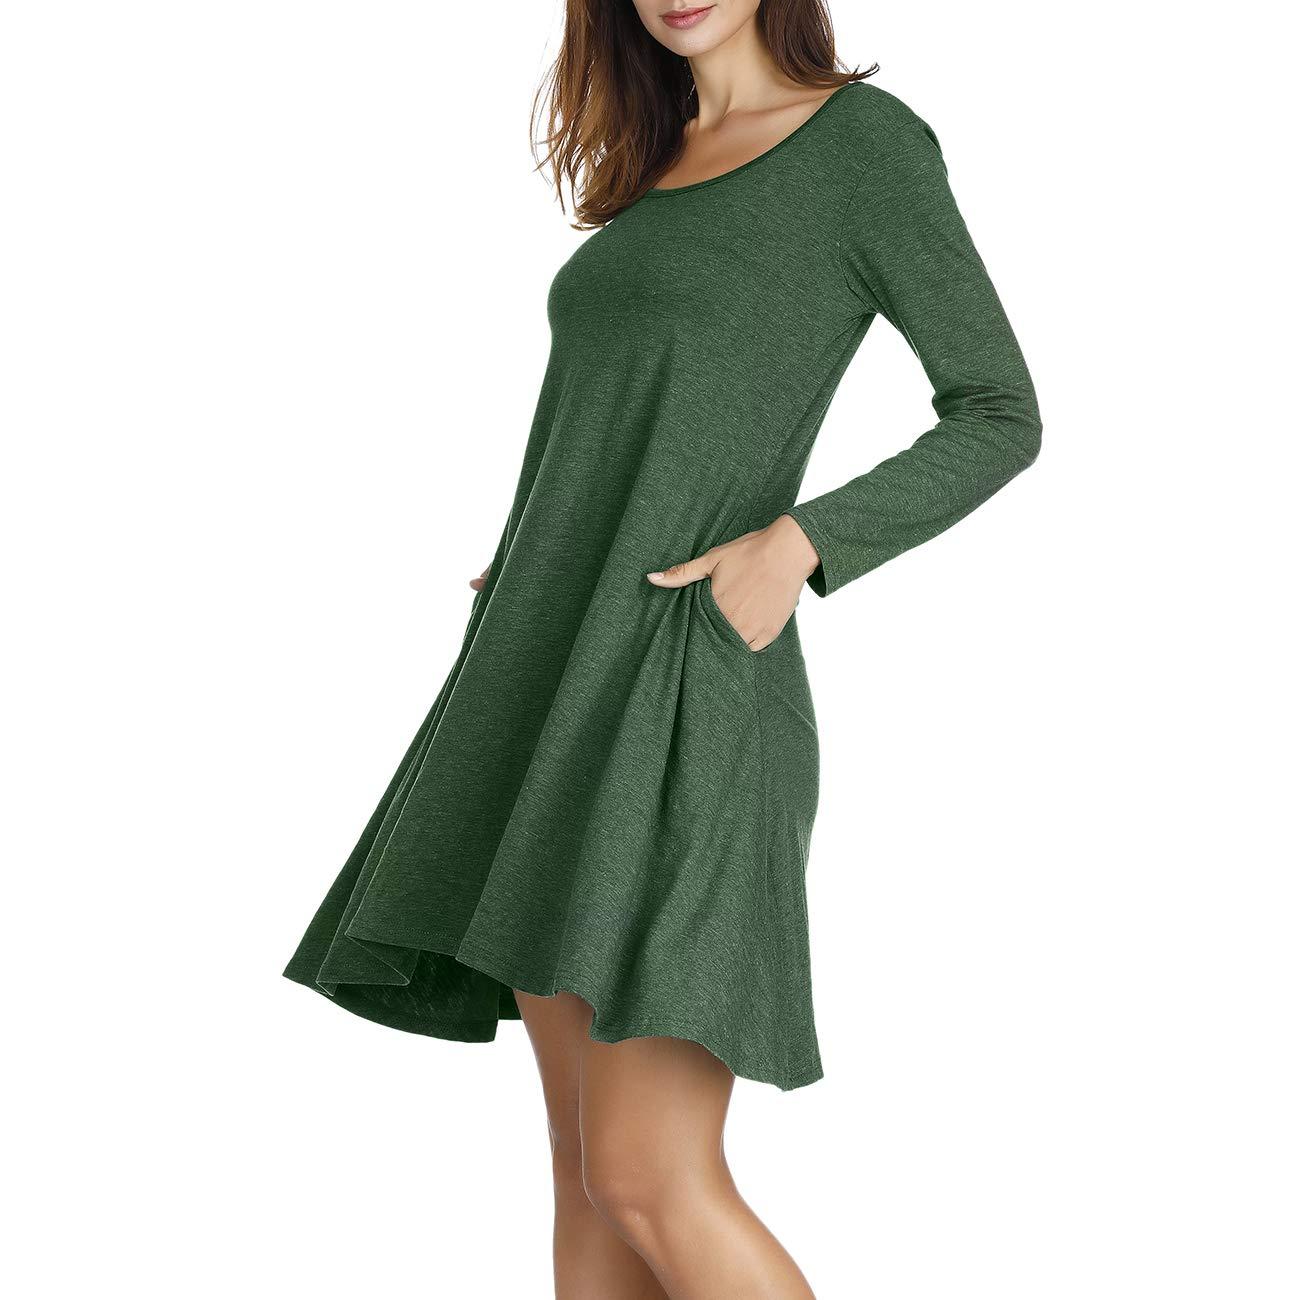 Naokenu Women Long Sleeve T Shirt Dress Pleated Swing Dress With